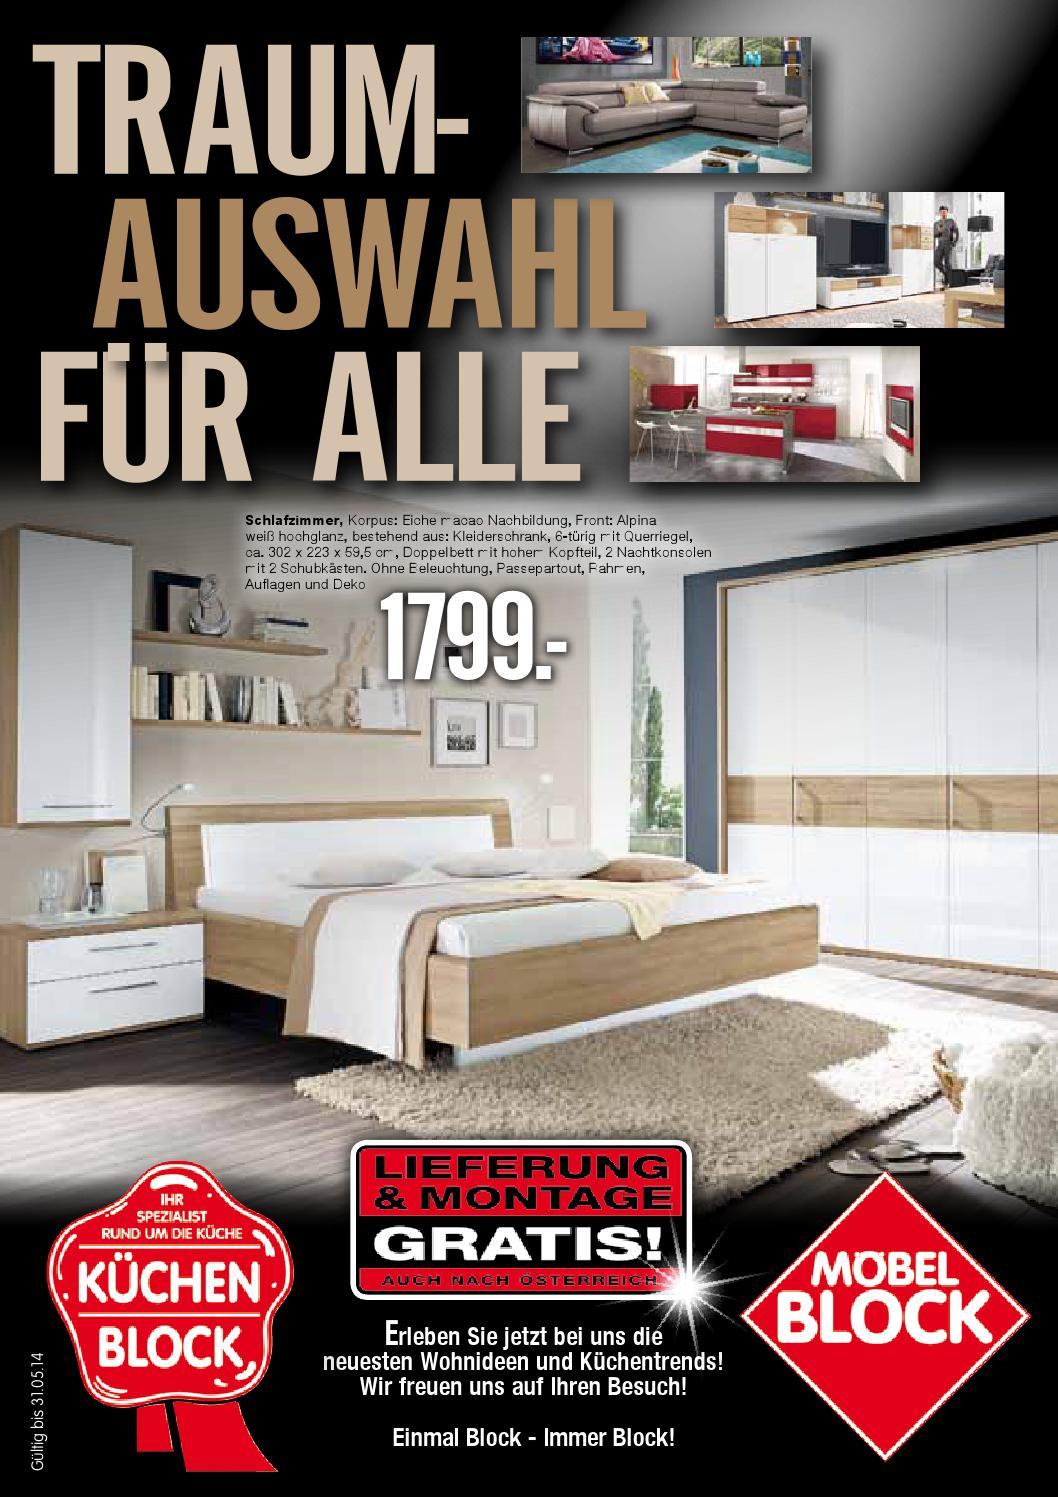 Moebelblock Kw18 By Russmedia Digital GmbH   Issuu